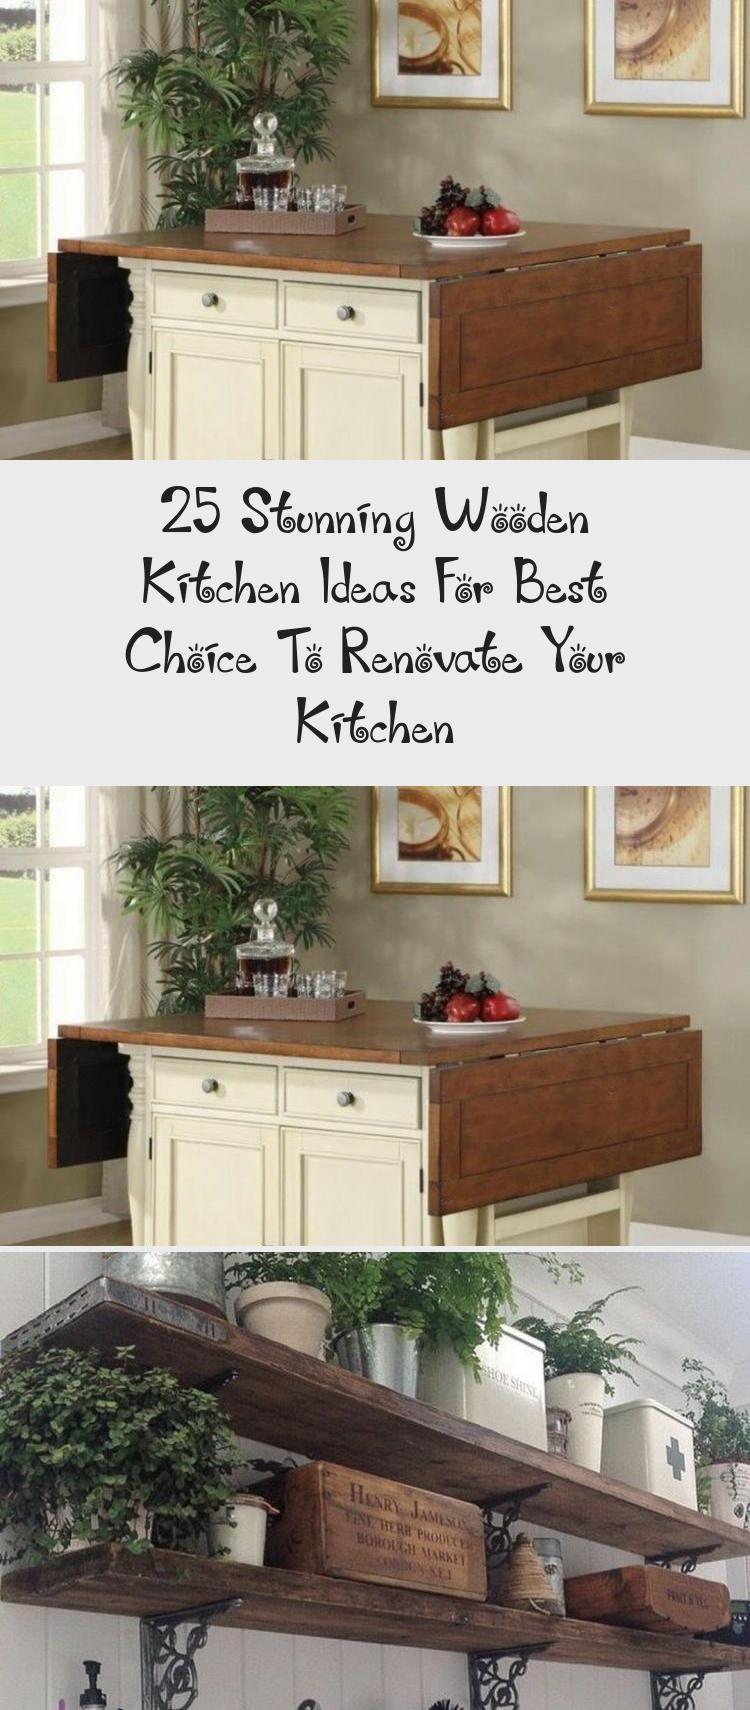 25 Stunning Wooden Kitchen Ideas For Best Choice To Renovate Your Kitchen Kitchen Room Design Interior Design Kitchen Wooden Shelves Kitchen